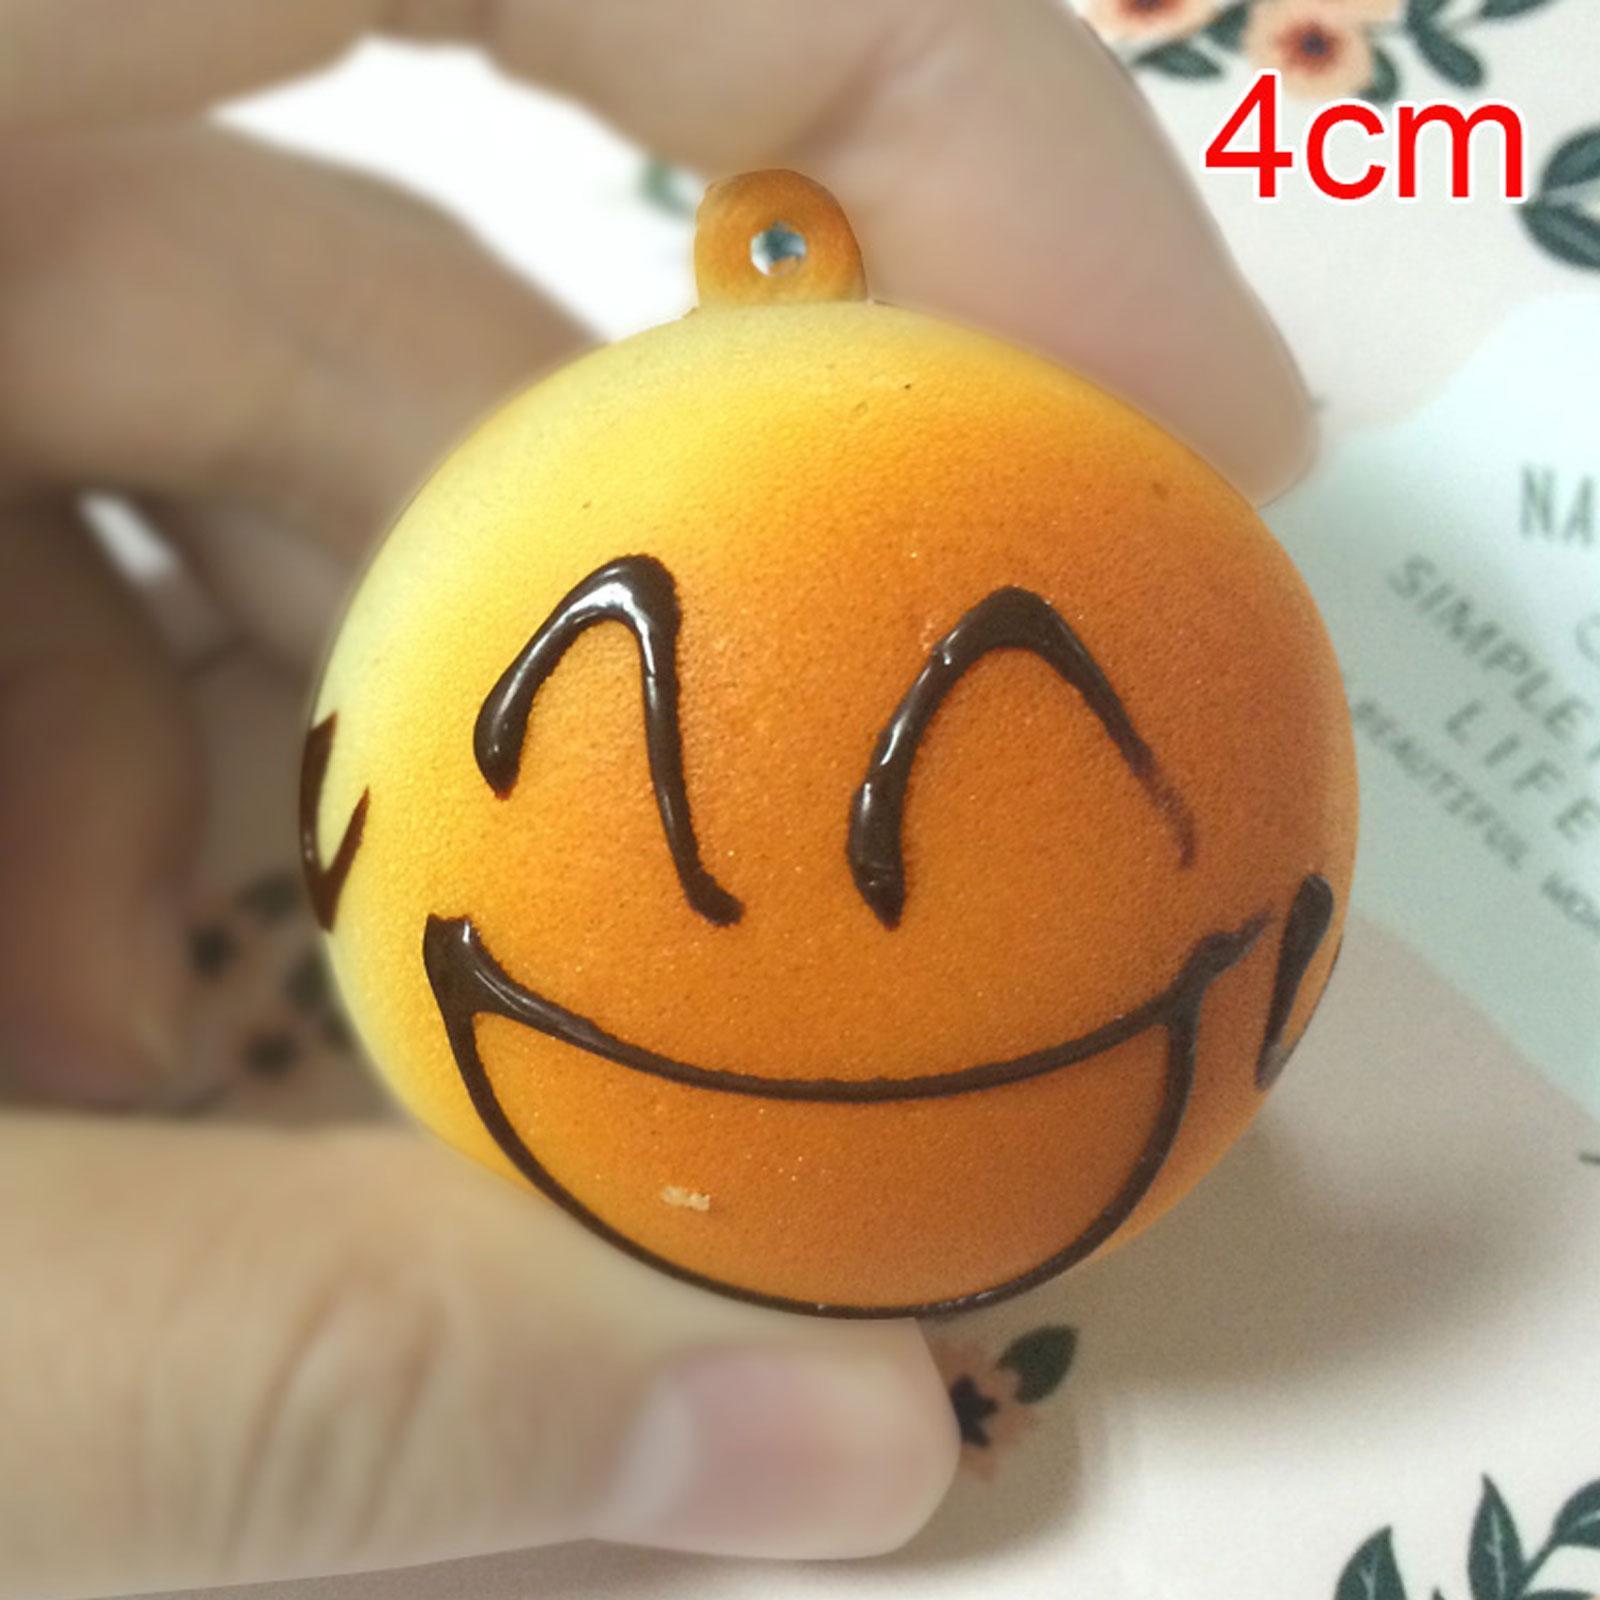 Squishy Super Cute Soft Buns Bread Charm Squishies Cell Phone Straps 4 CM Bread Straps Bag Key ...